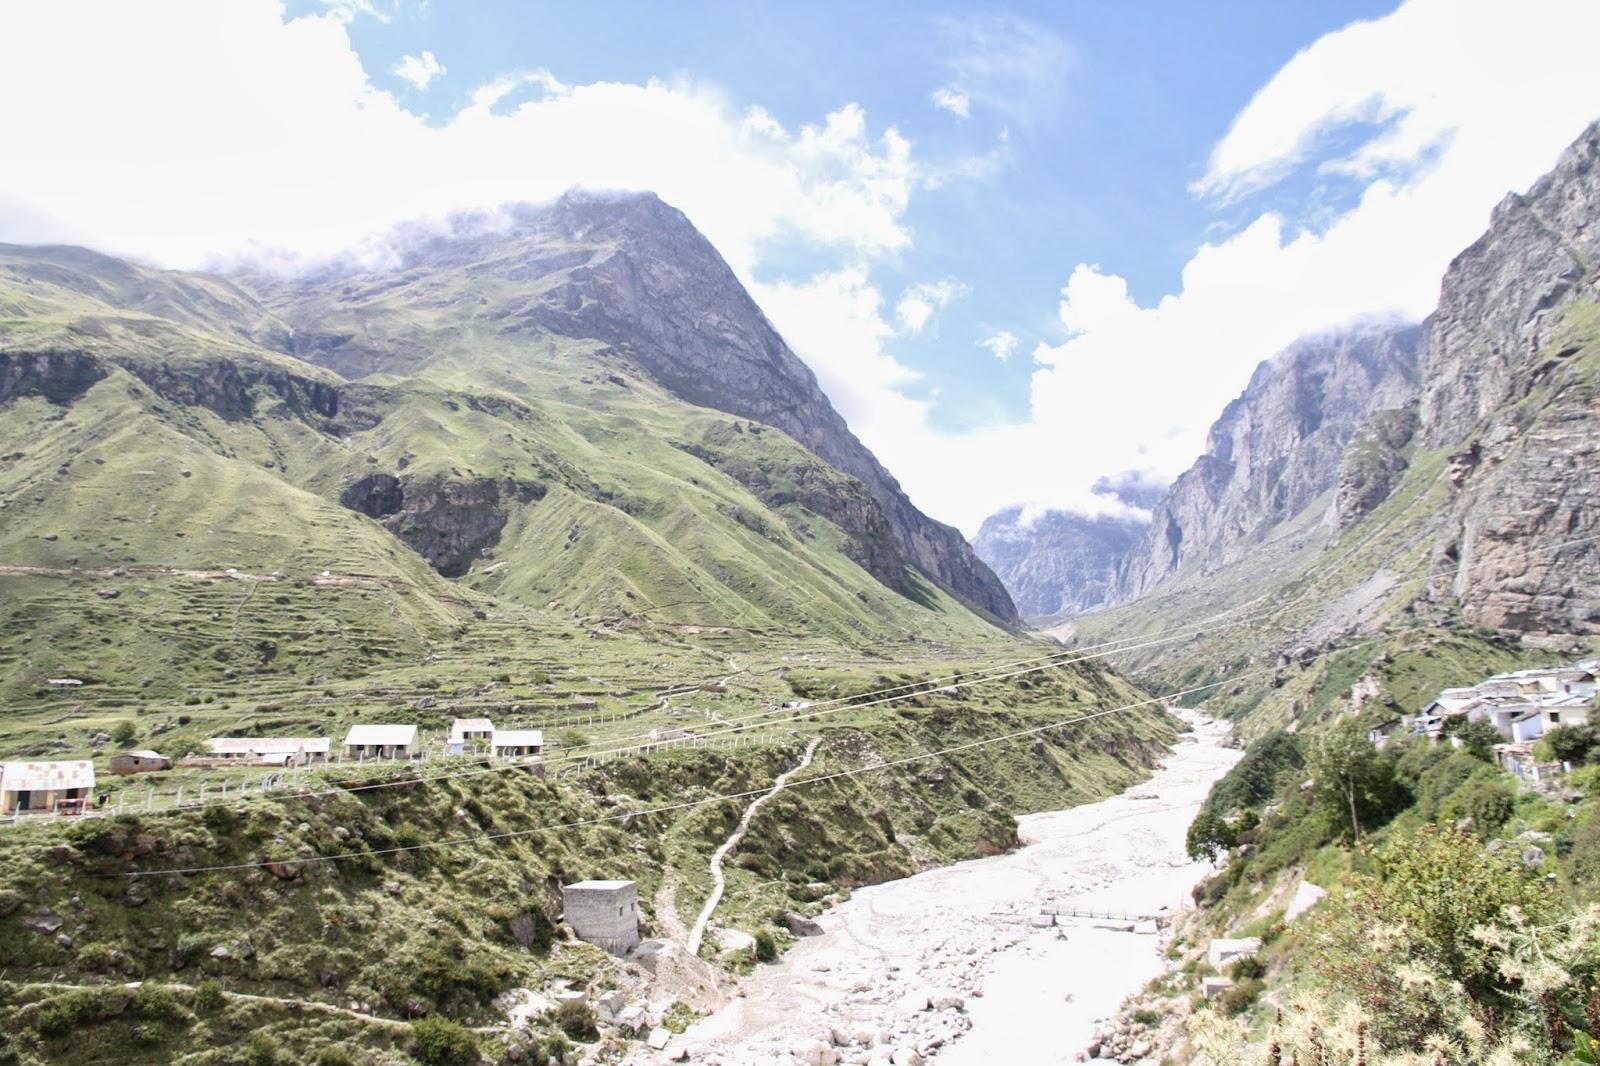 Himalayas, Pancha Prayags - Sri Ramanin Padhayil